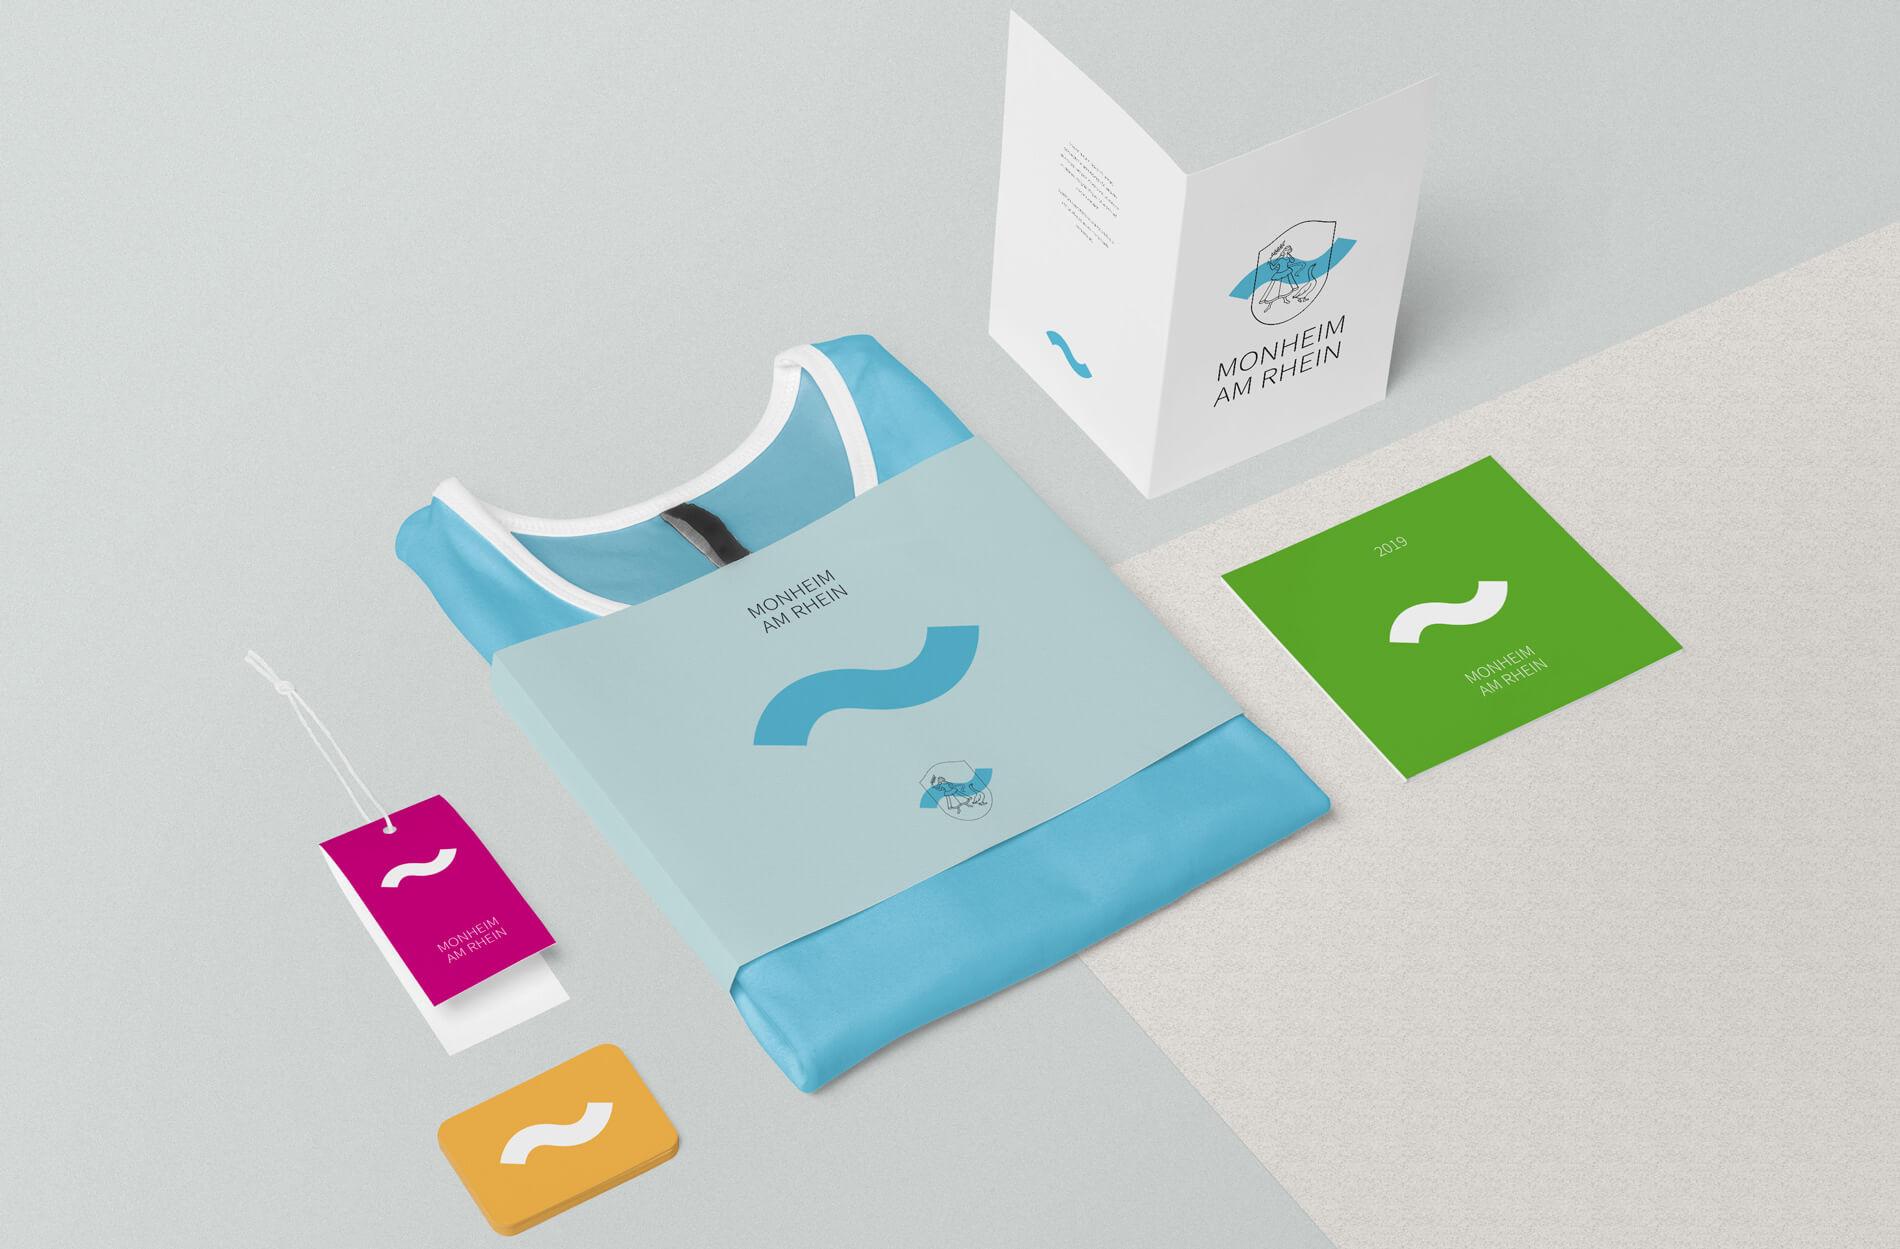 Monheim am Rhein T-Shirt, Einladungskarte, Postkarte